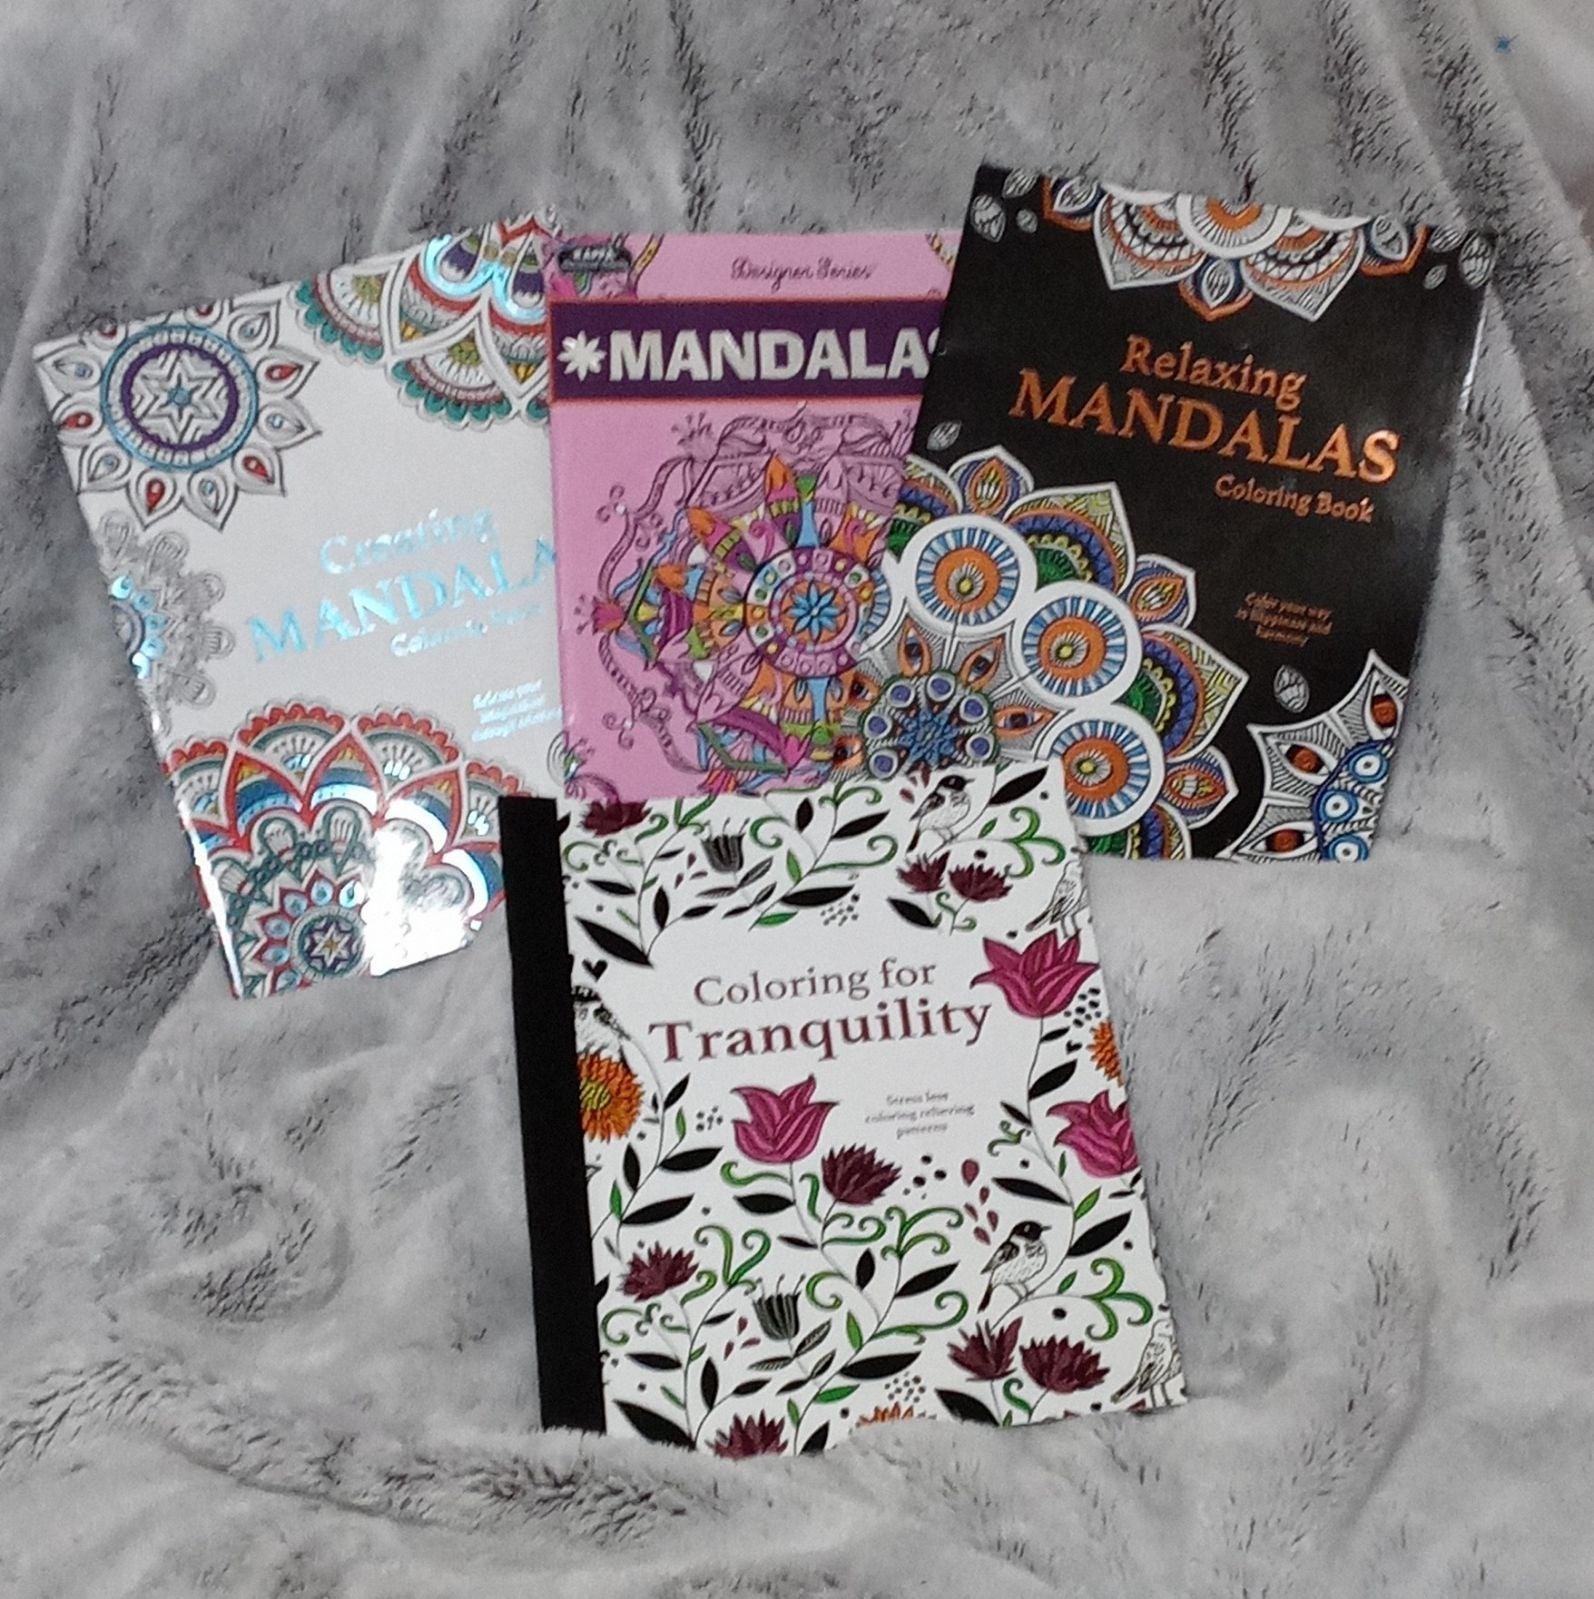 Mandalas/Tranquility Adult Coloring